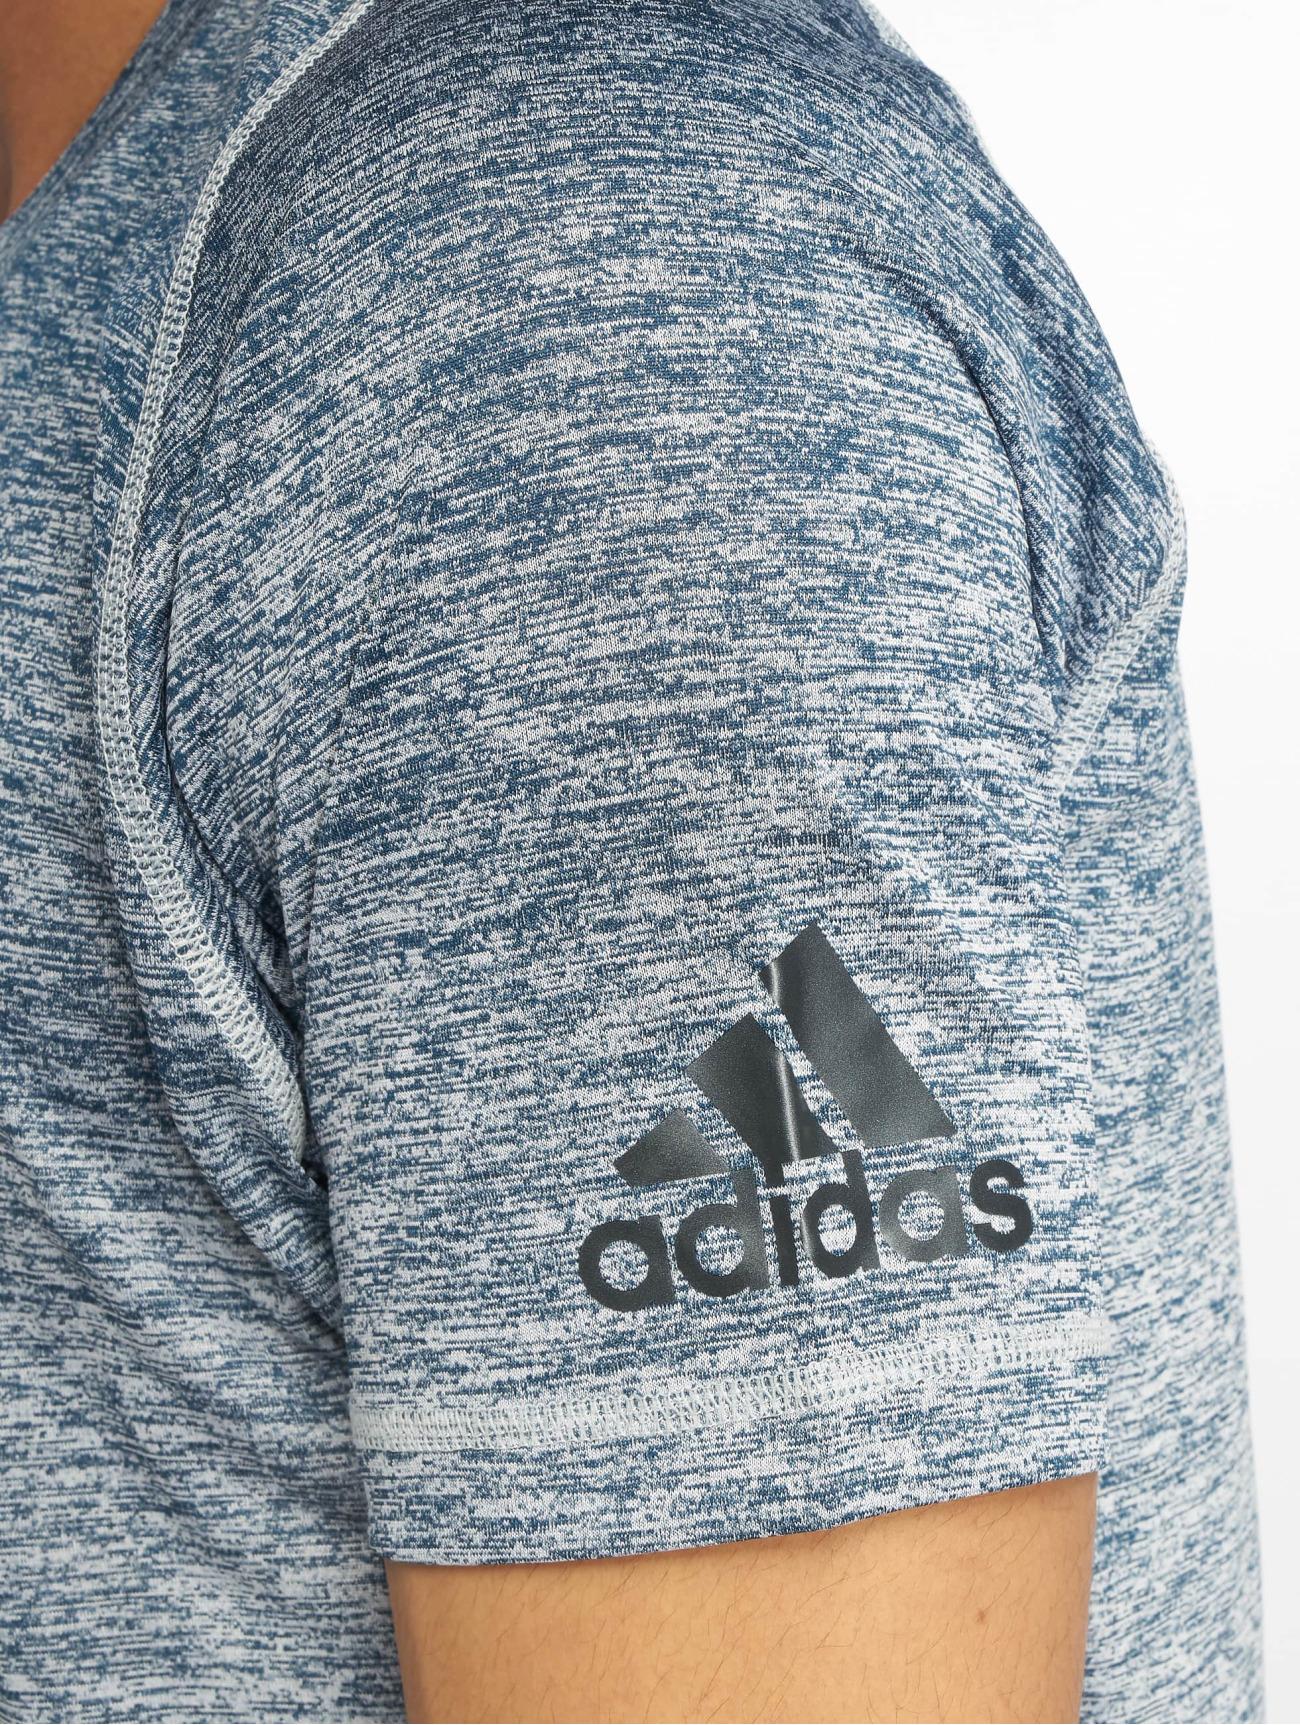 adidas Performance | 360   bleu Homme T-Shirt  617846| Homme Hauts